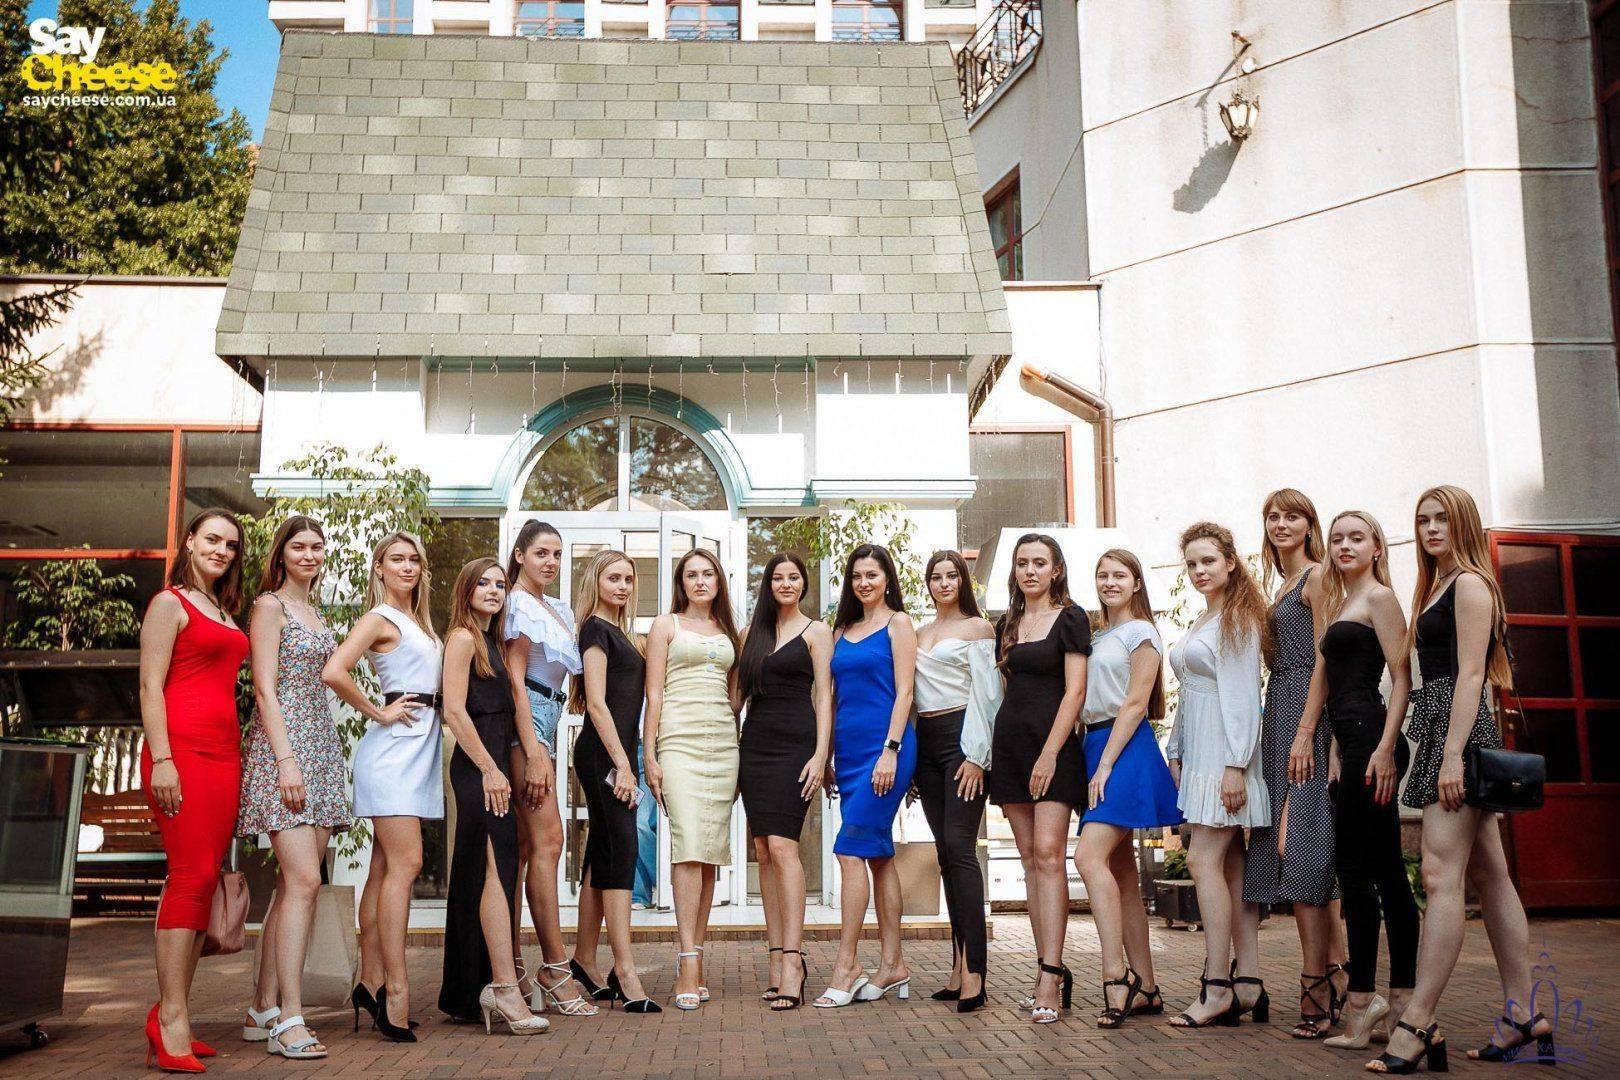 04-07 Miss Kharkov фотоотчет Saycheese